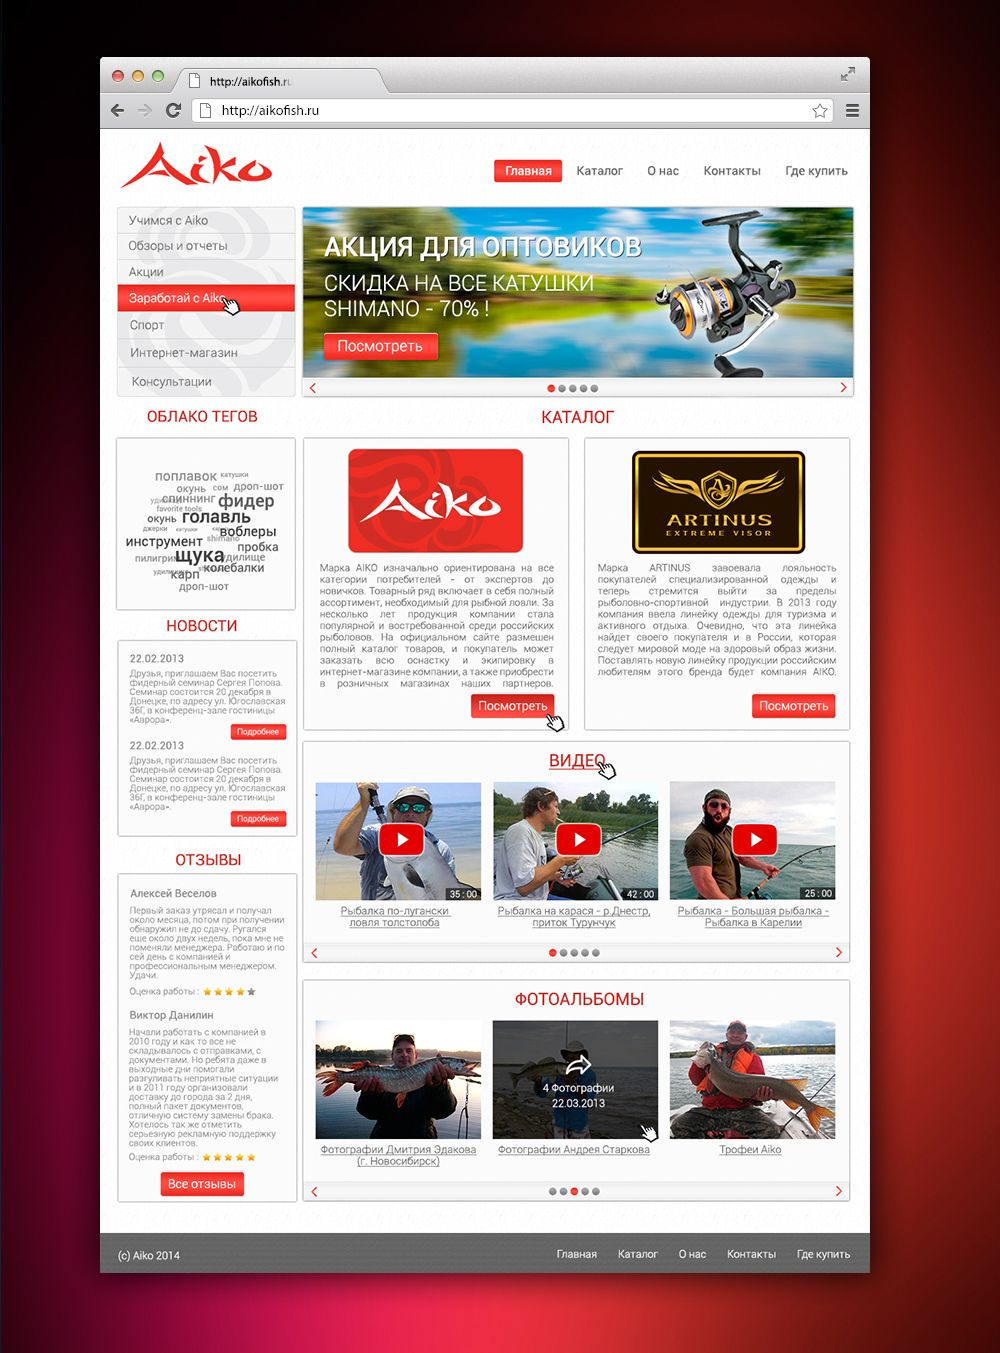 Редизайн сайта - дизайнер moderndesign